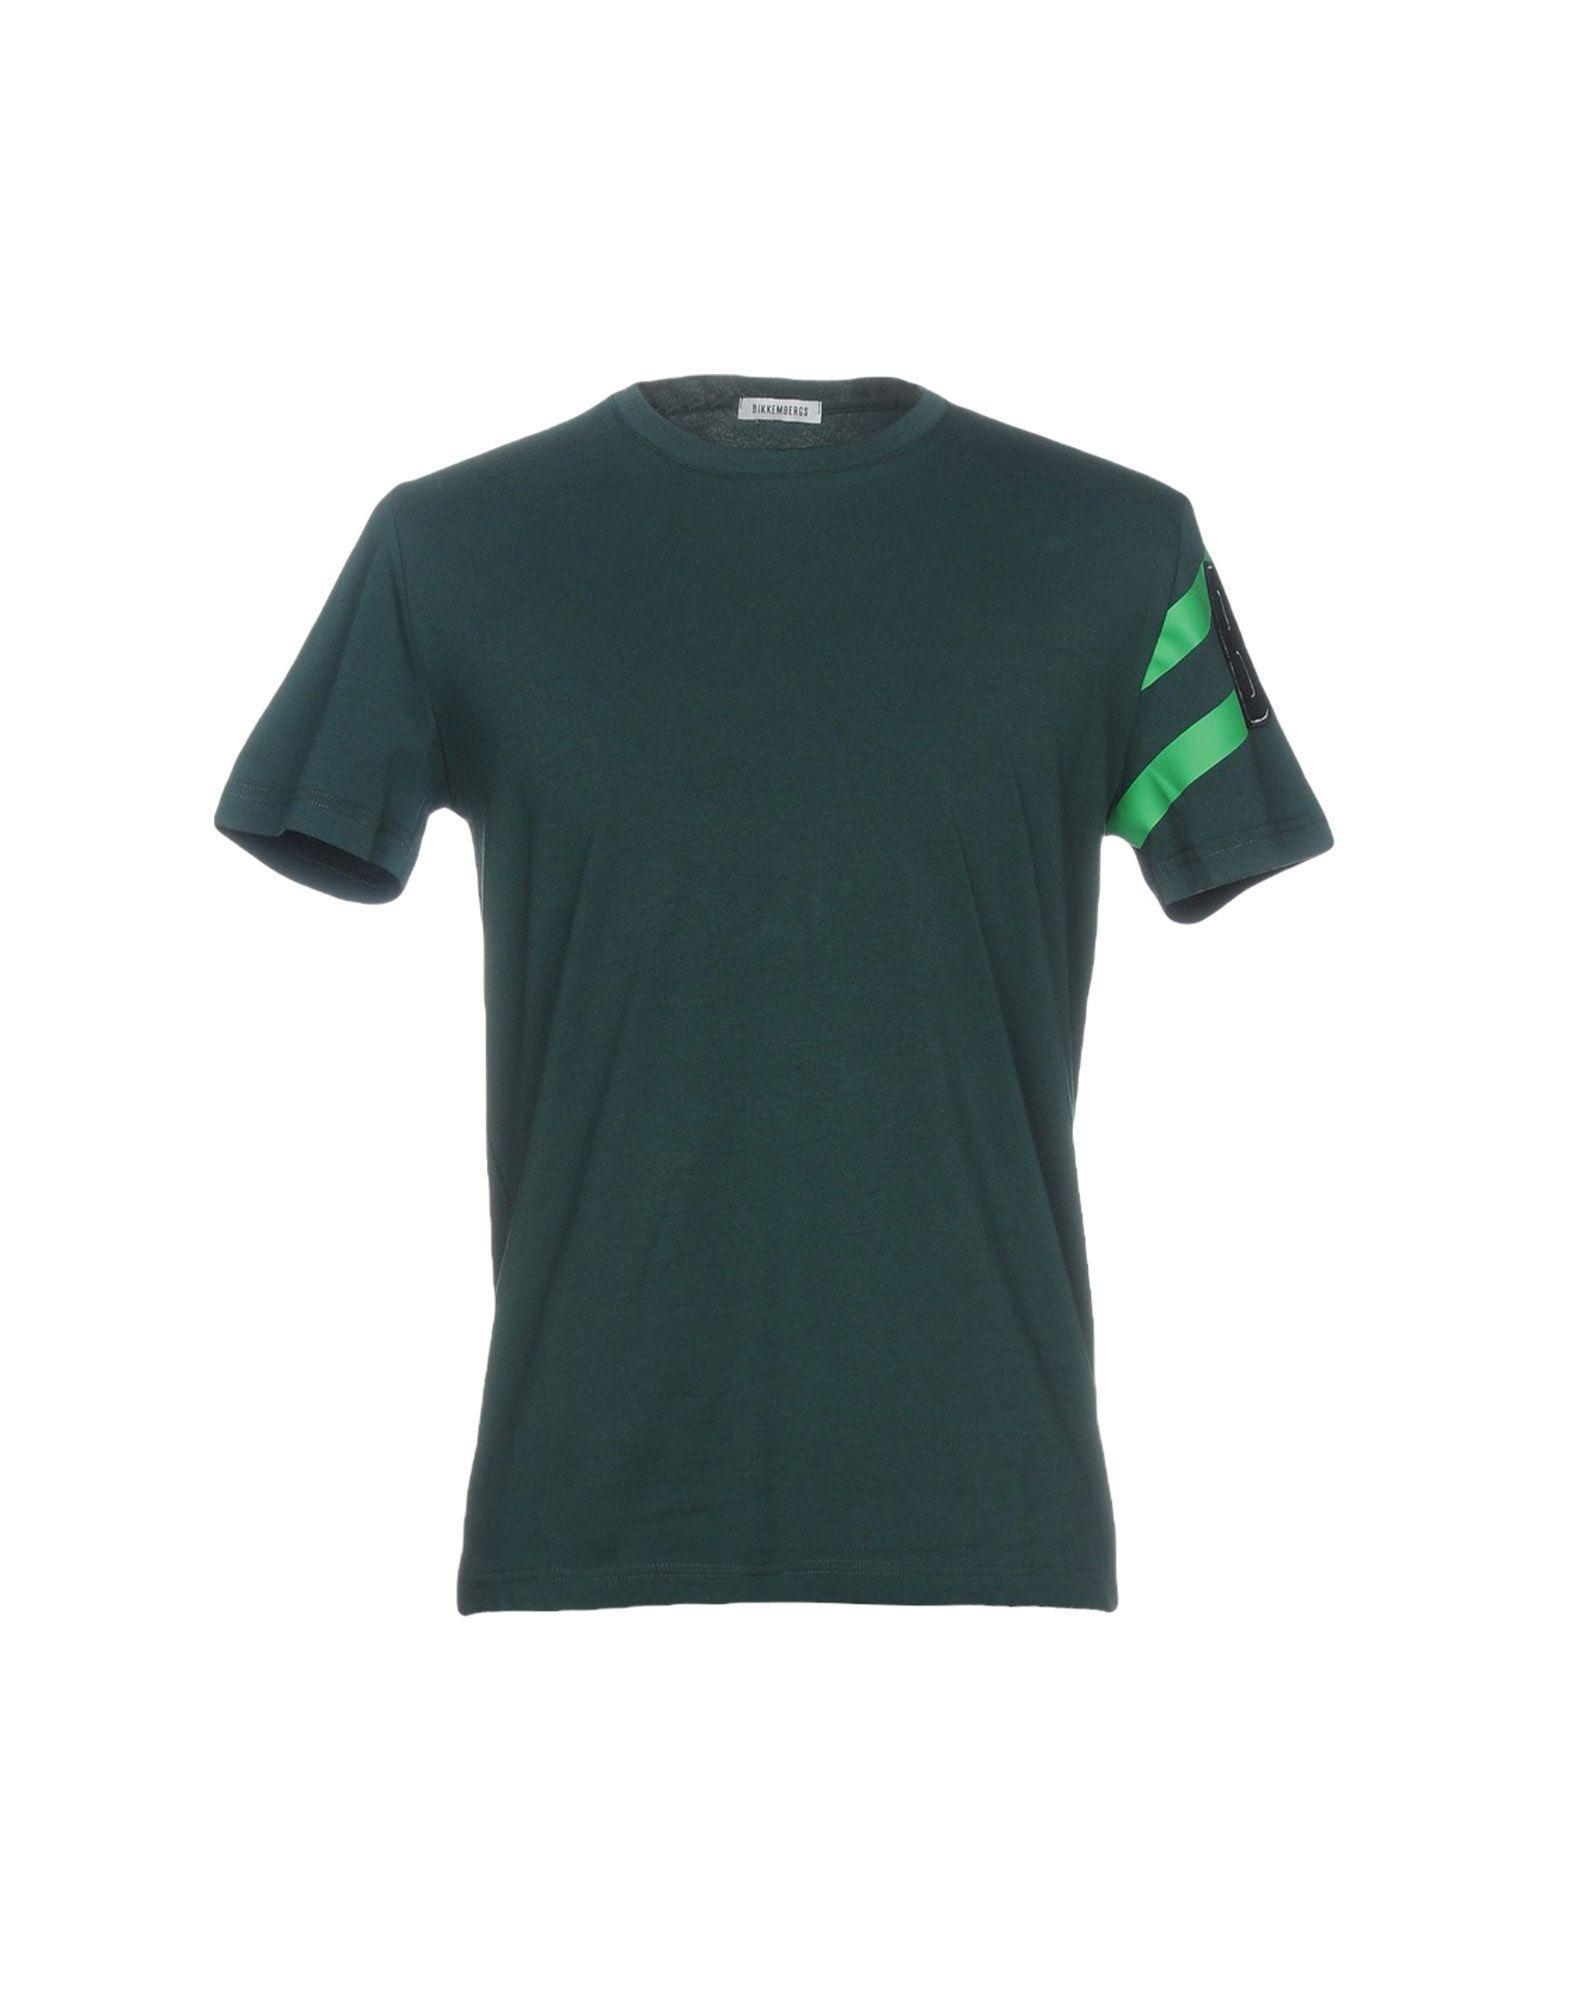 Bikkembergs T-shirt In Dark Green